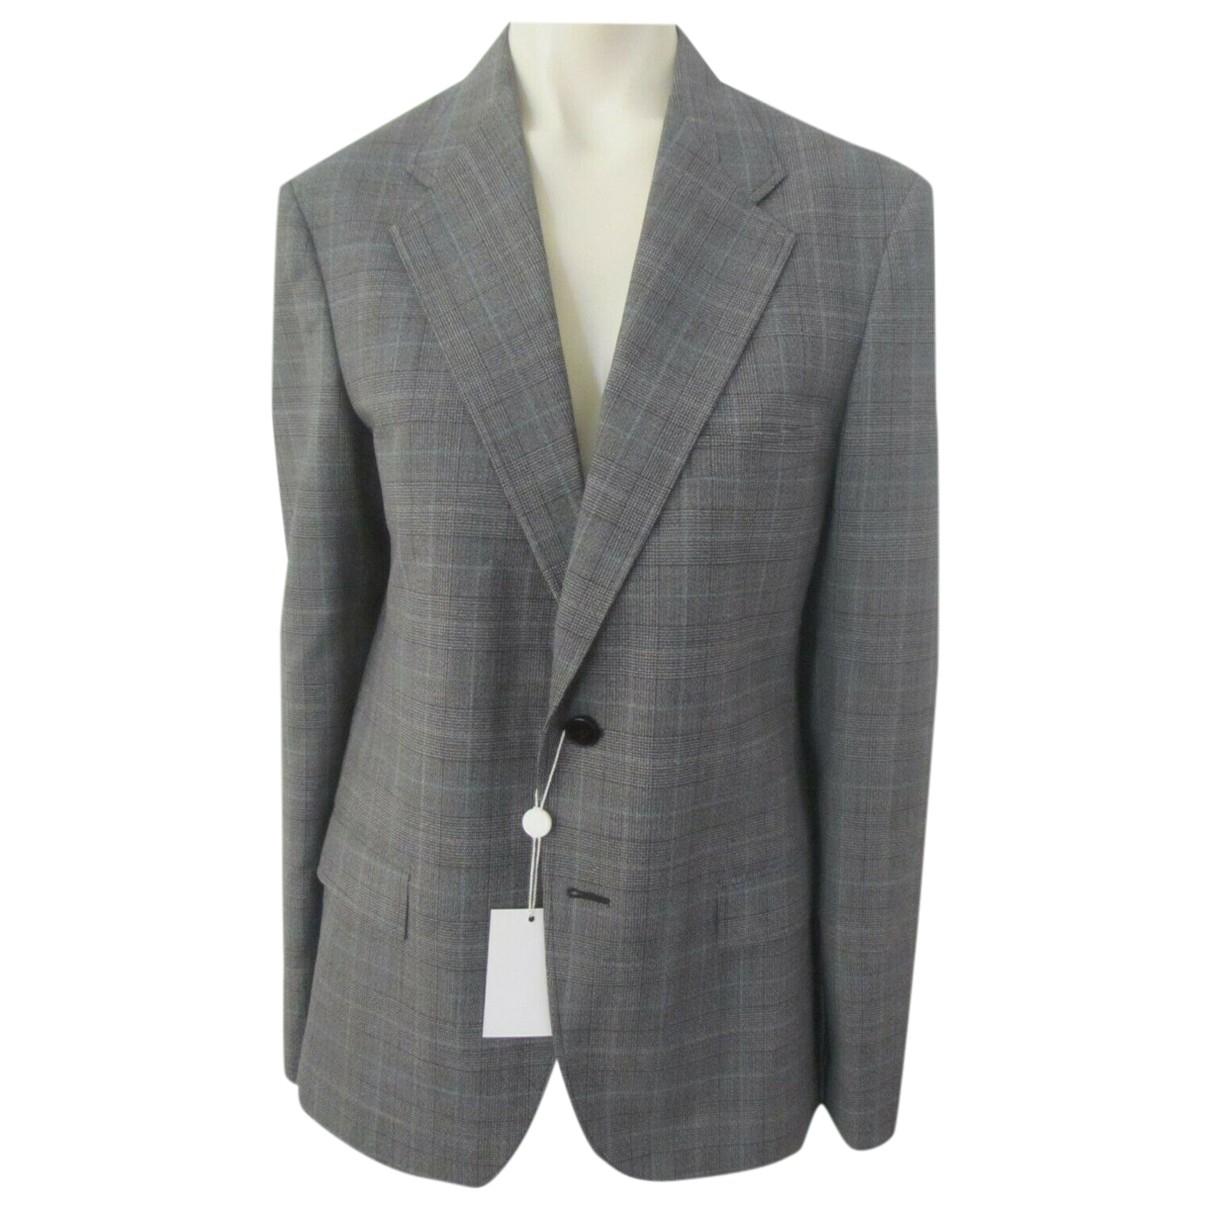 Maison Martin Margiela \N Grey Wool jacket  for Men 48 IT